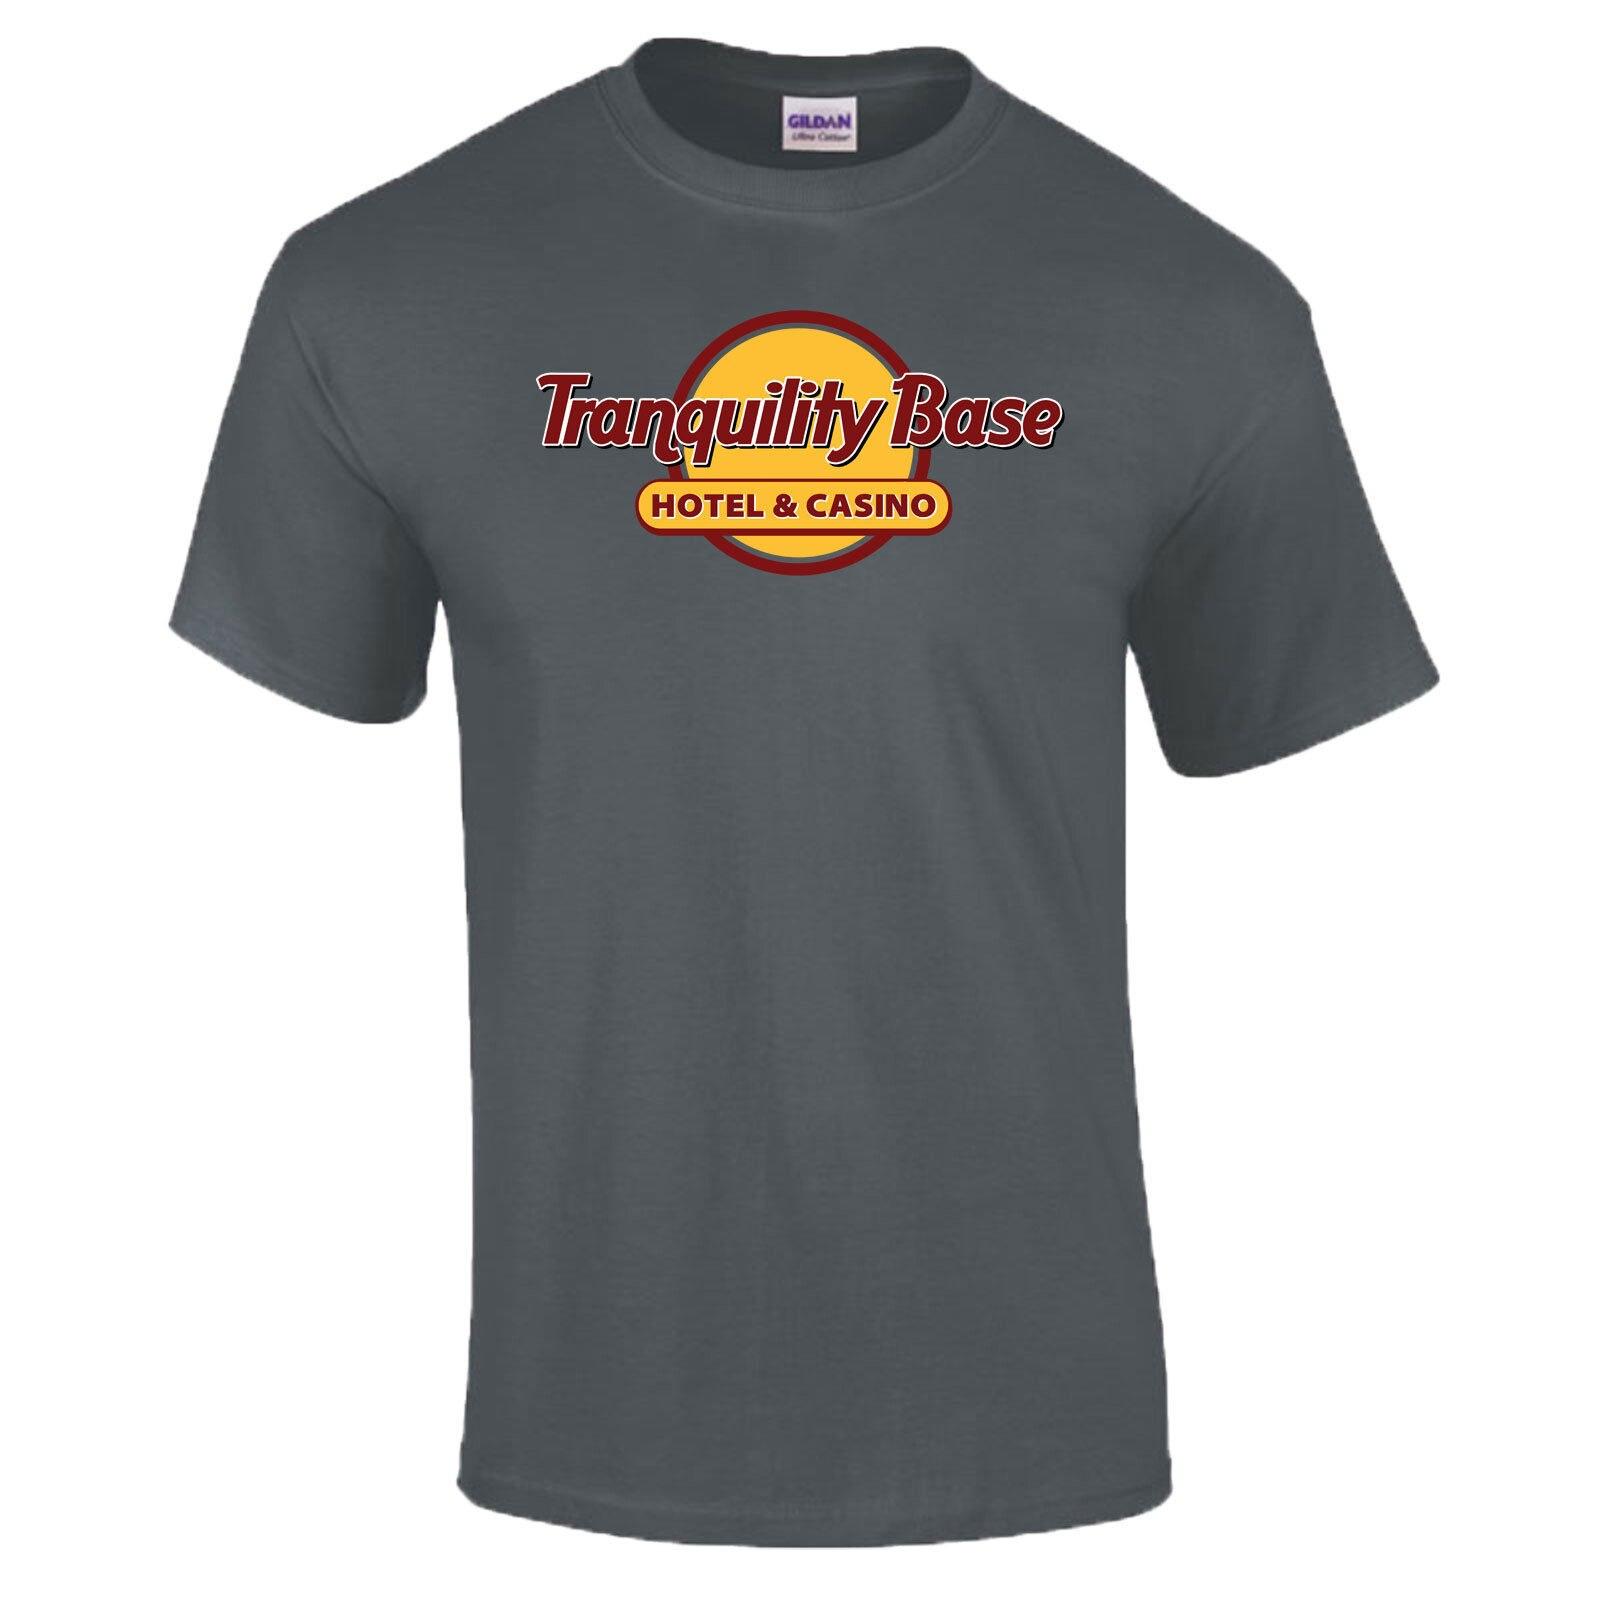 39b60fb49 Tranquility Base Hotel & Casino Spoof PREMIUM T-Shirt S - 5XL New T Shirts